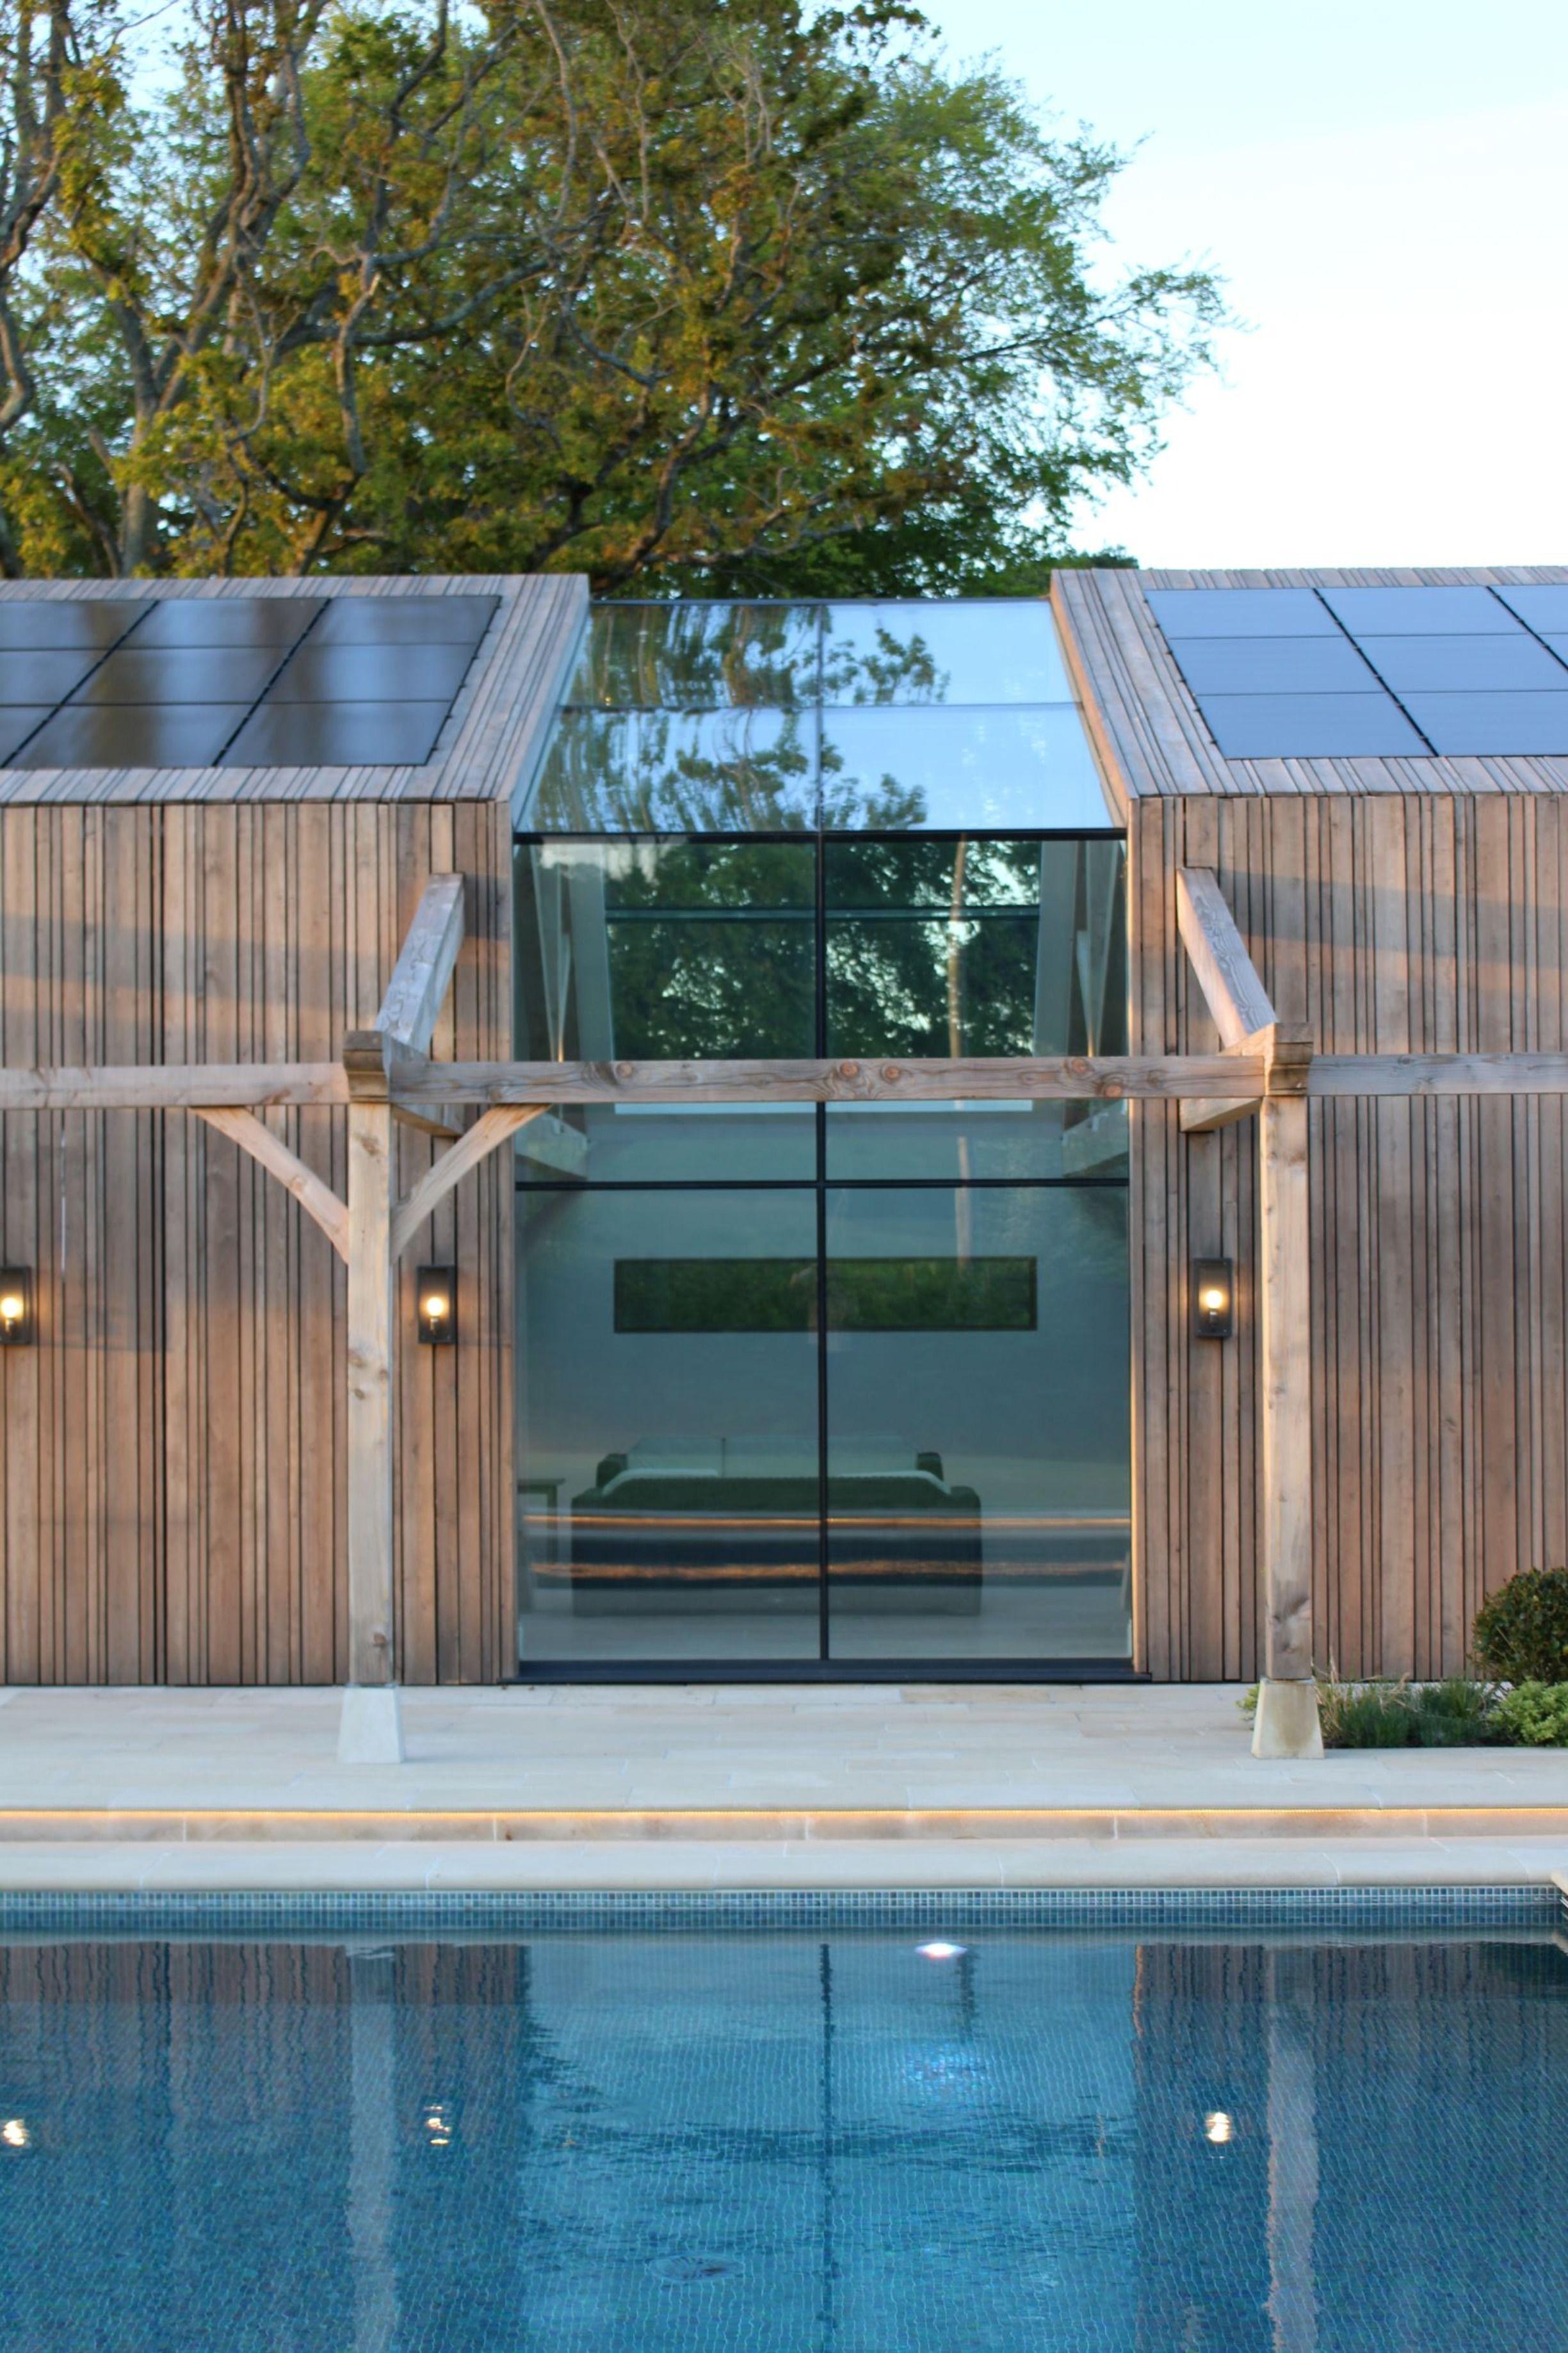 The Studio Richmond Bell Architects Solar Panels Architecture Larch Cladding Architect